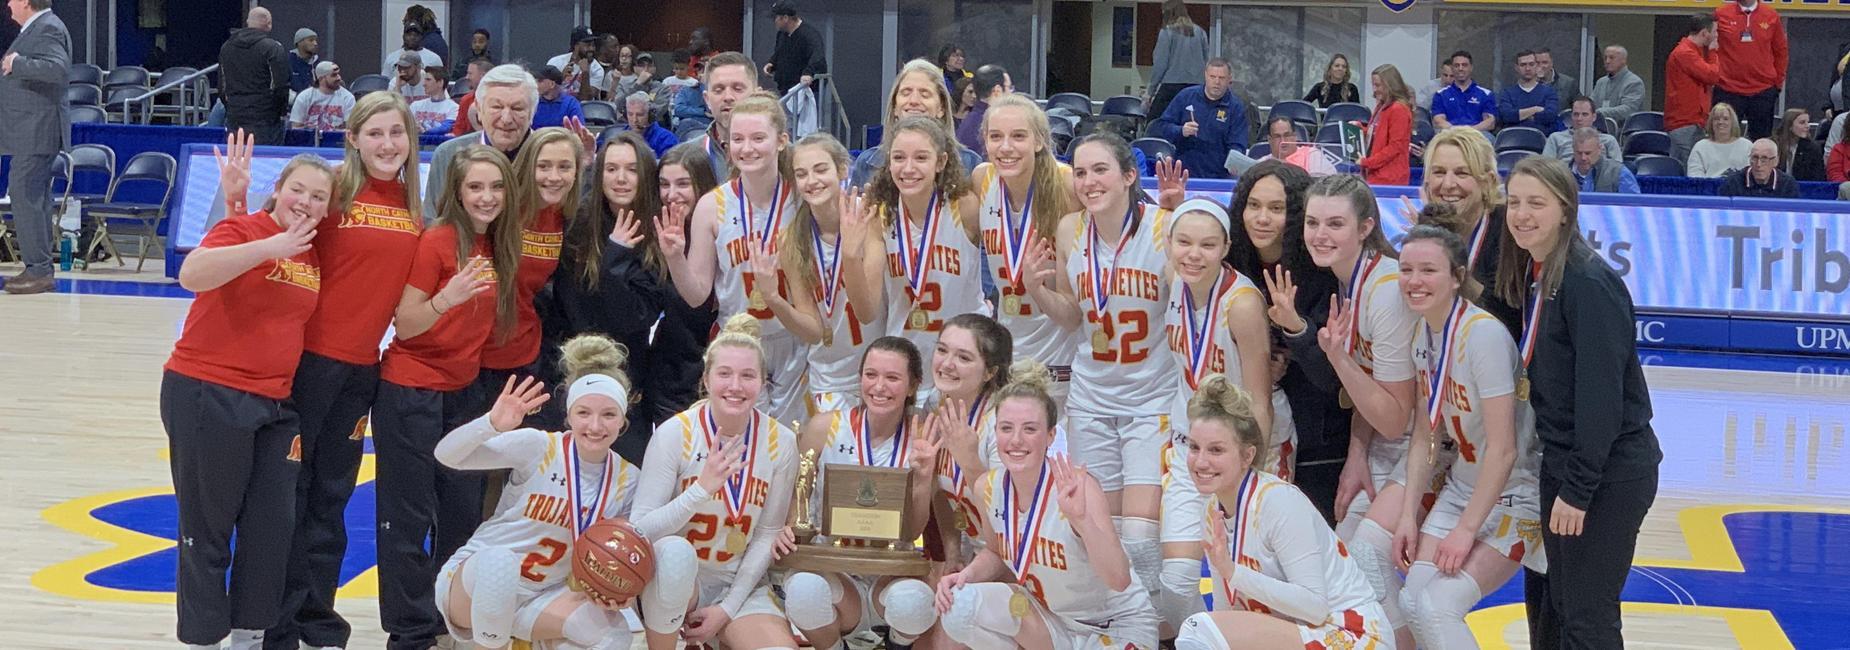 North Catholic Girls' Basketball Team WPIAL Champions